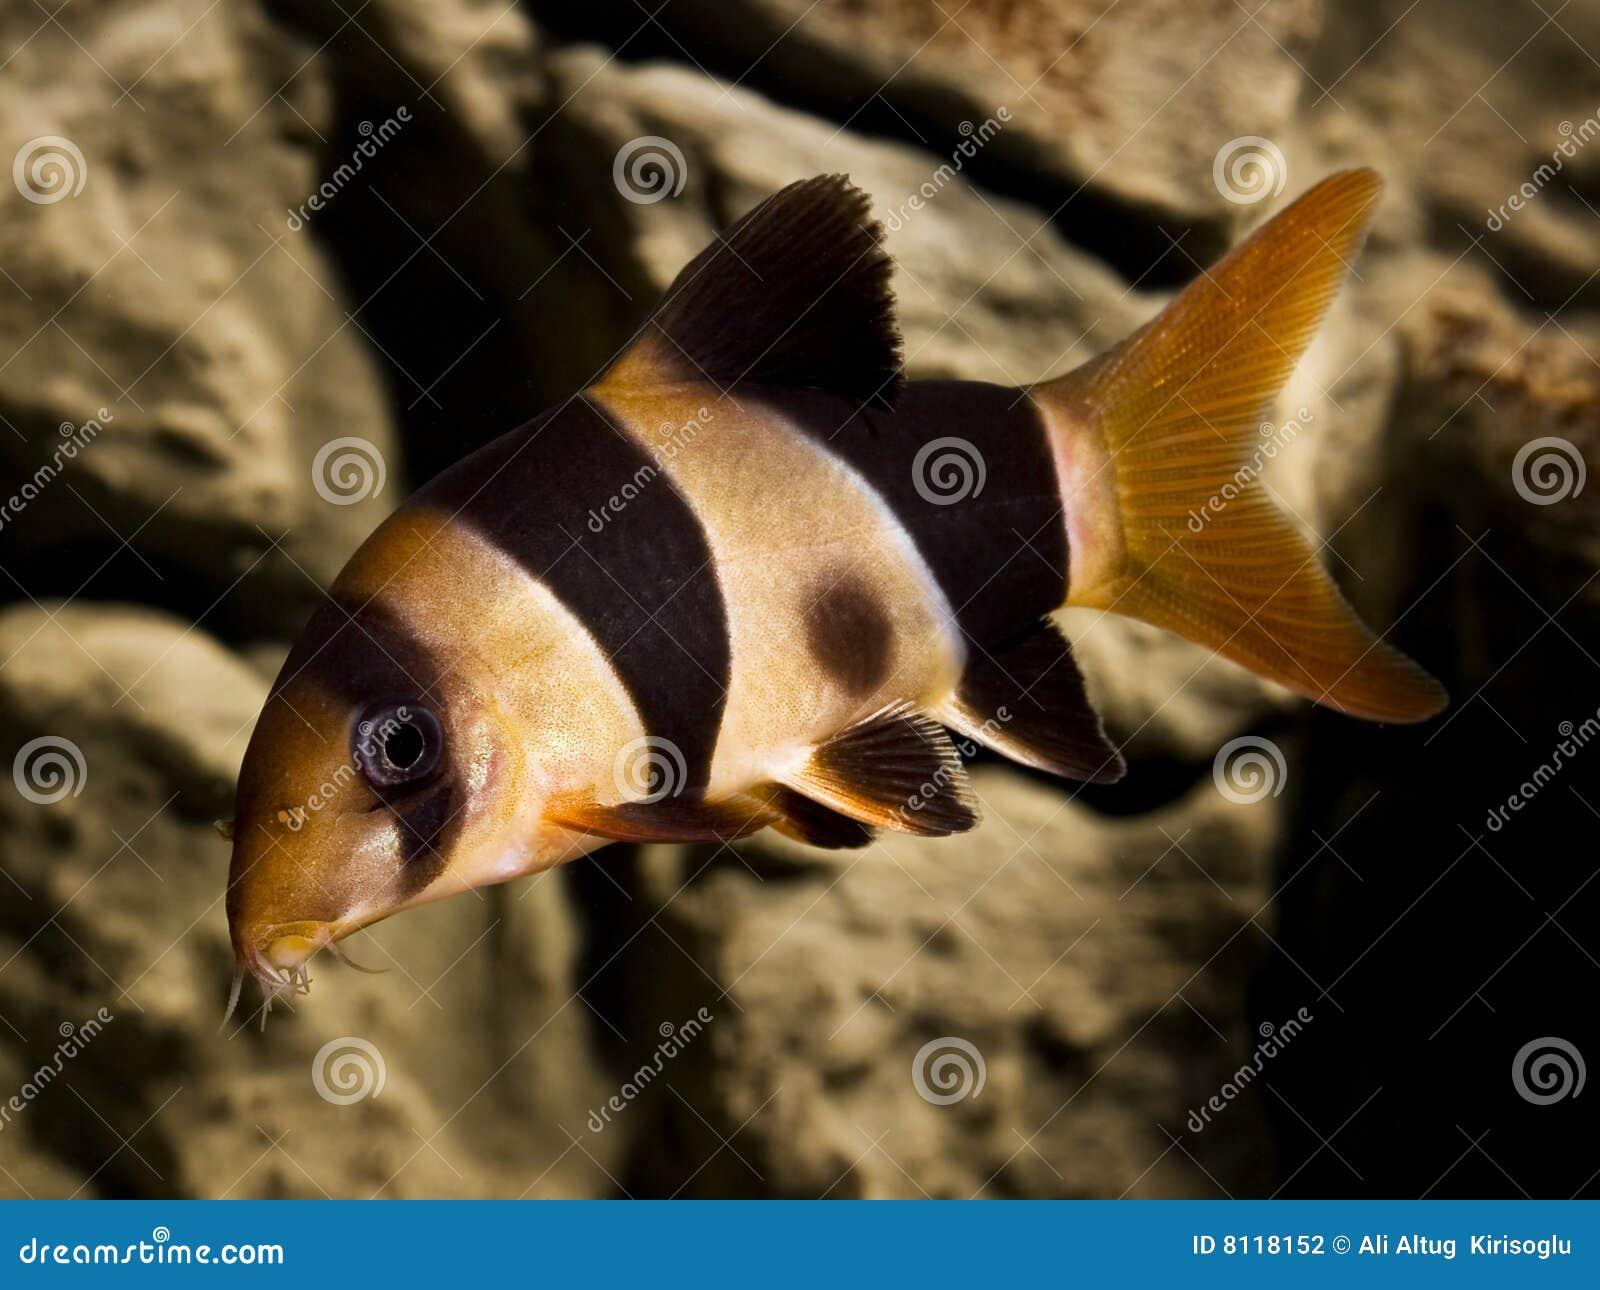 Clown loach fish botia macracantha stock photo image for Clown loach fish